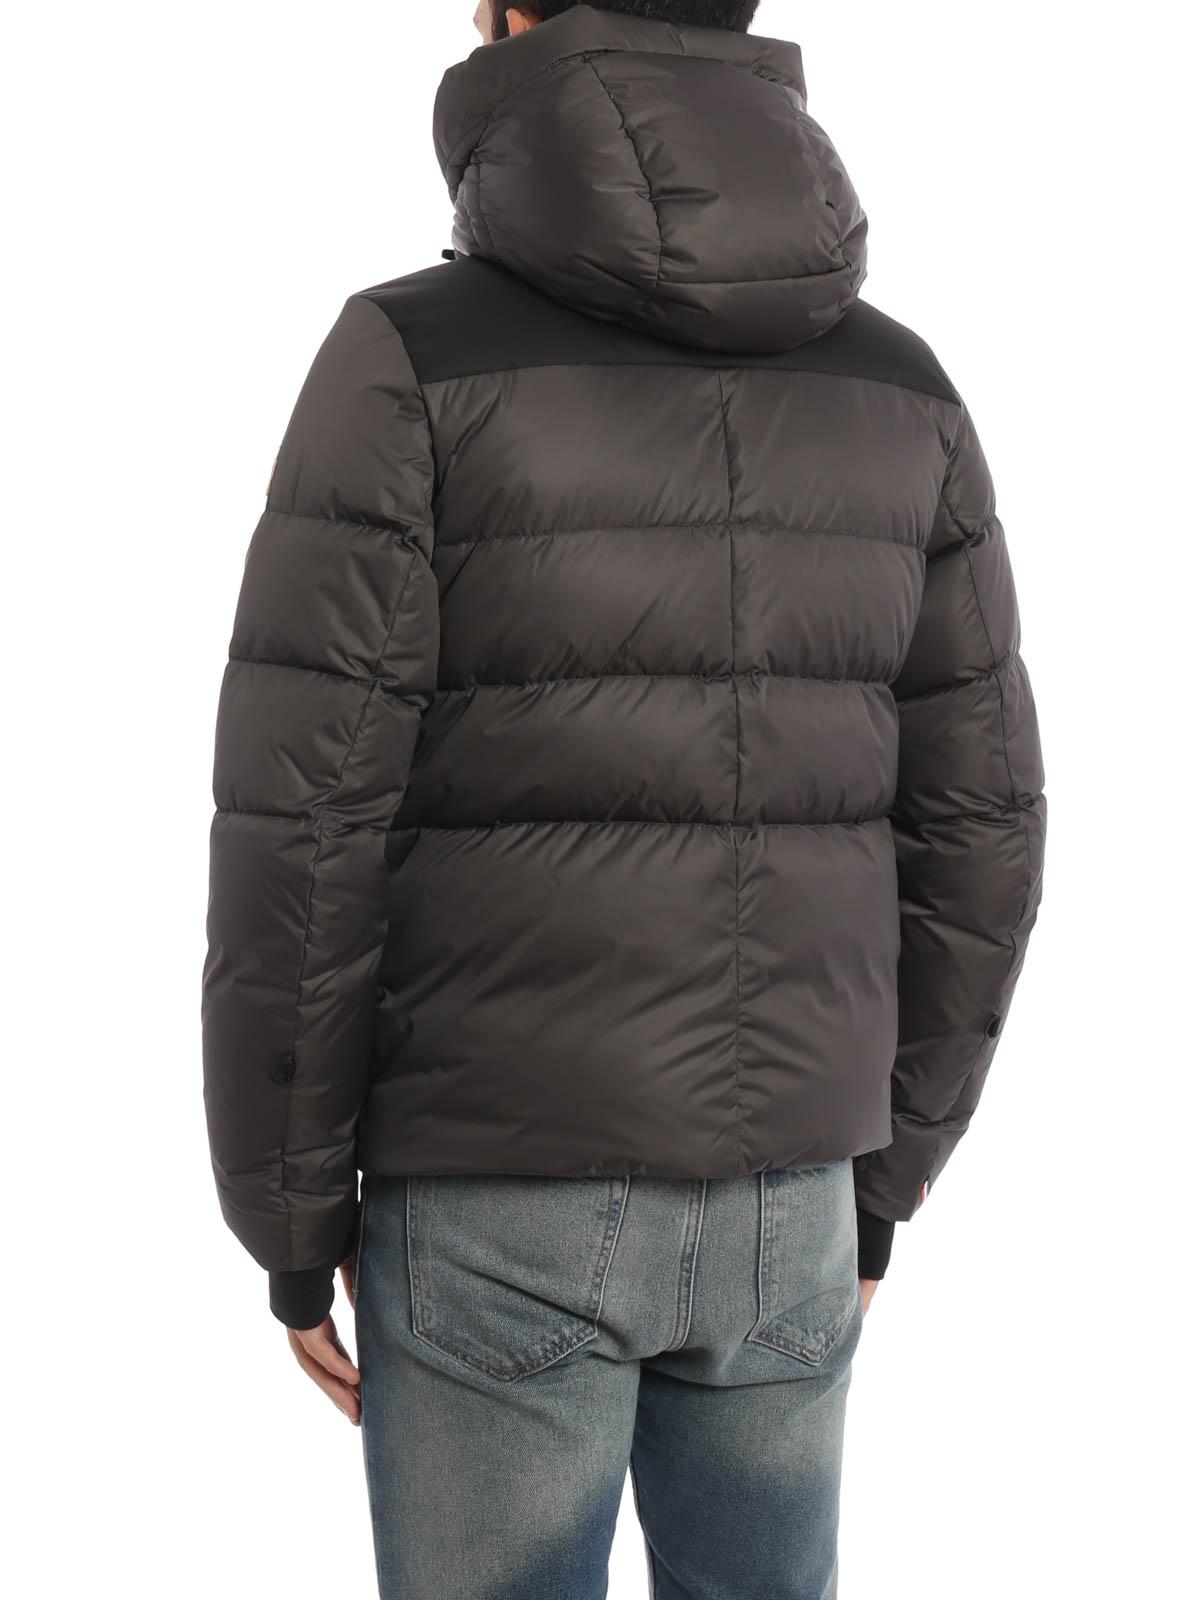 5addf0e36 italy moncler rodenberg puffer coat quiz 2199b 36ce7